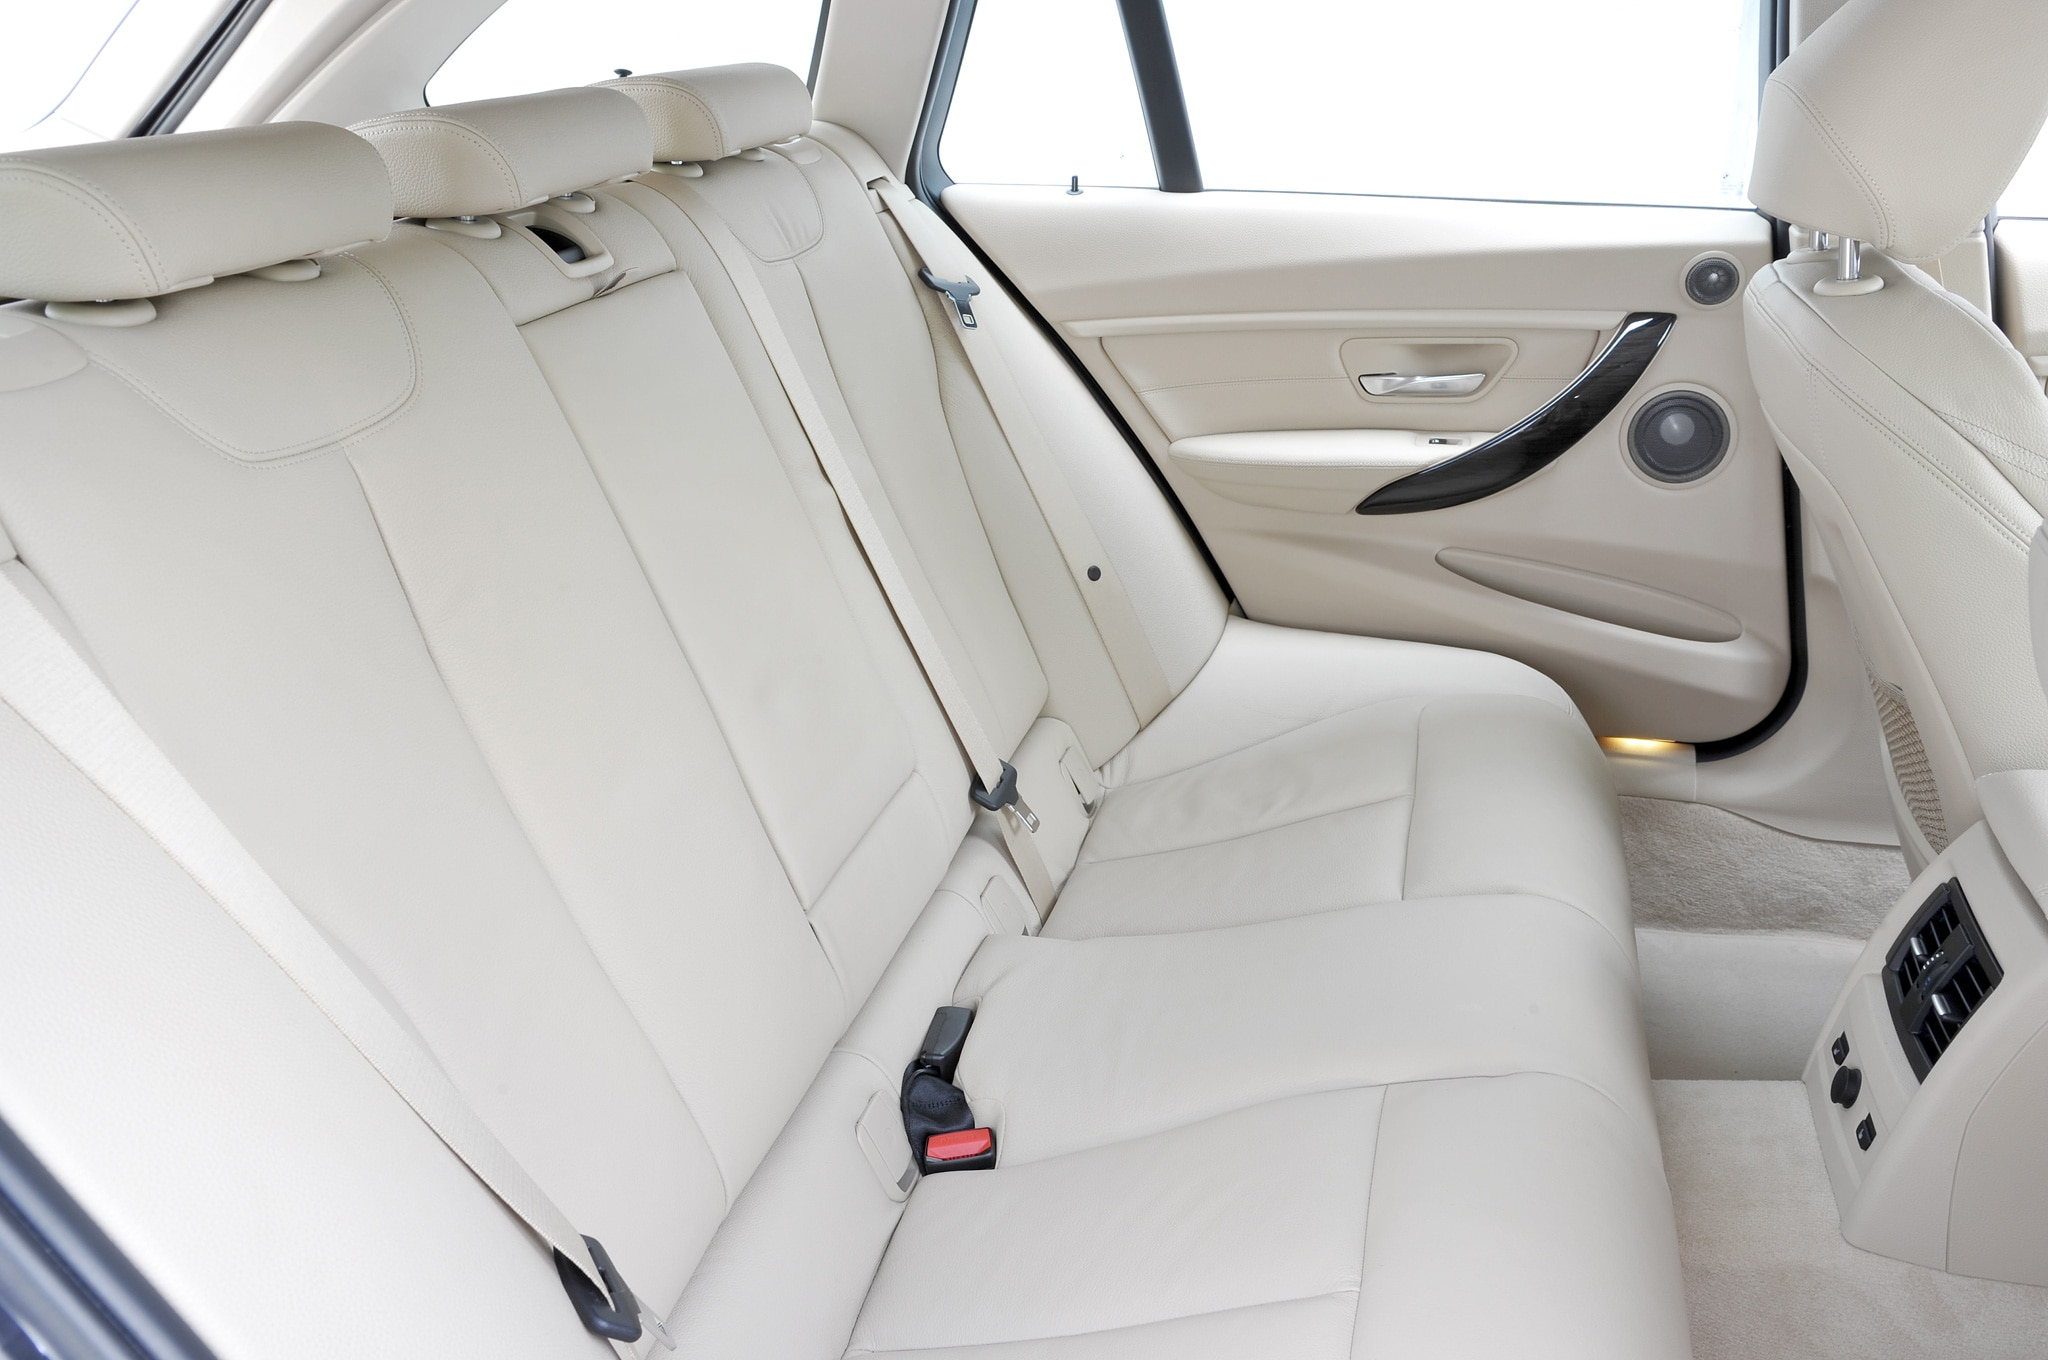 2013 BMW 328i M Sport line - Editors' Notebook - Automobile